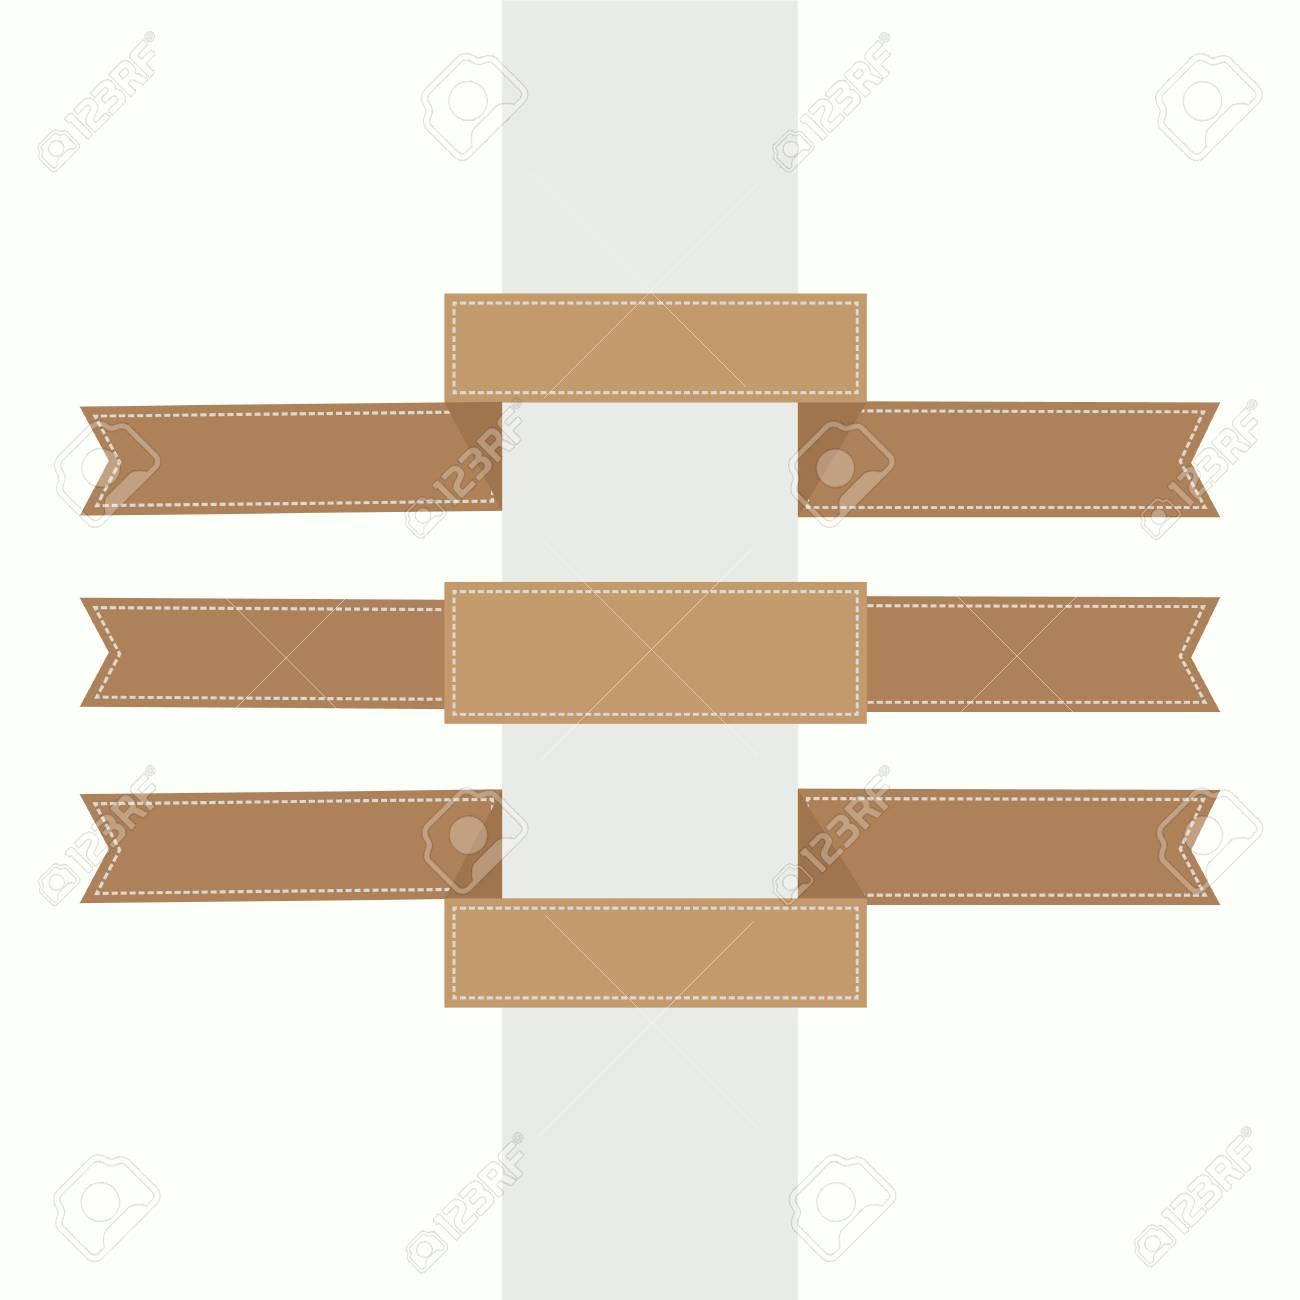 Set of vector ad ribbons - illustration Stock Vector - 18403071